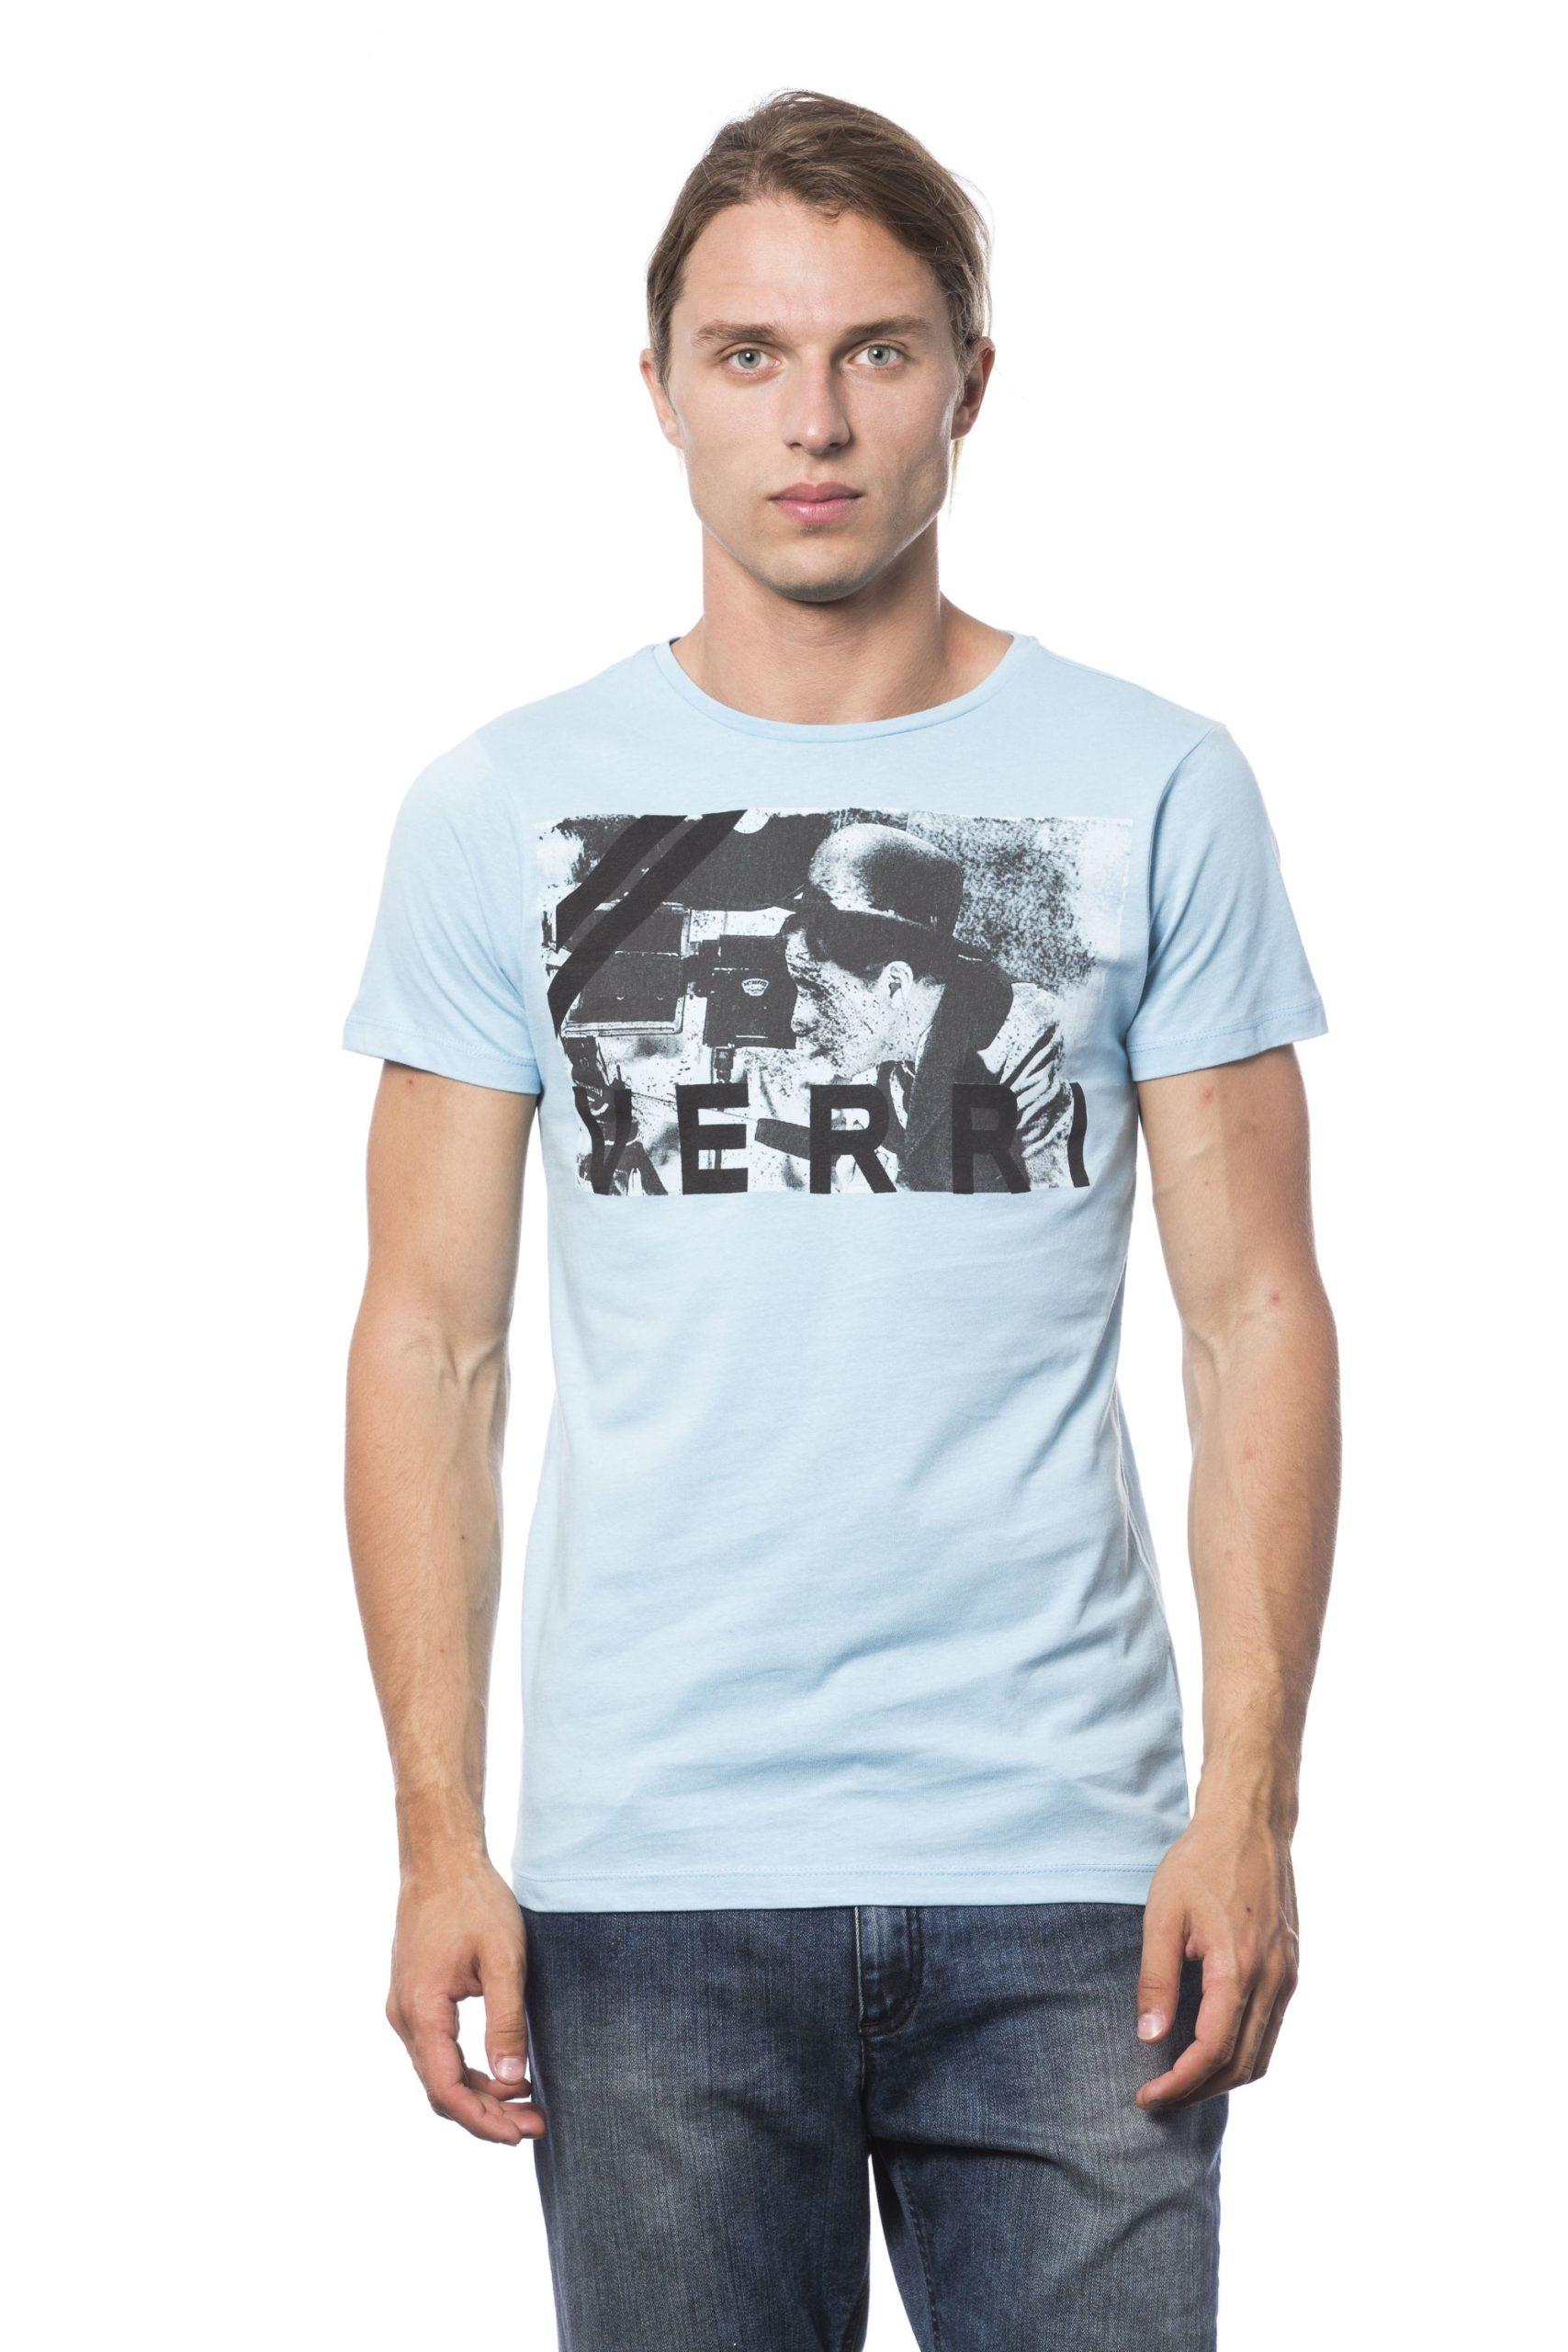 Verri Men's Azzurro Sky T-Shirt Blue VE686007 - S